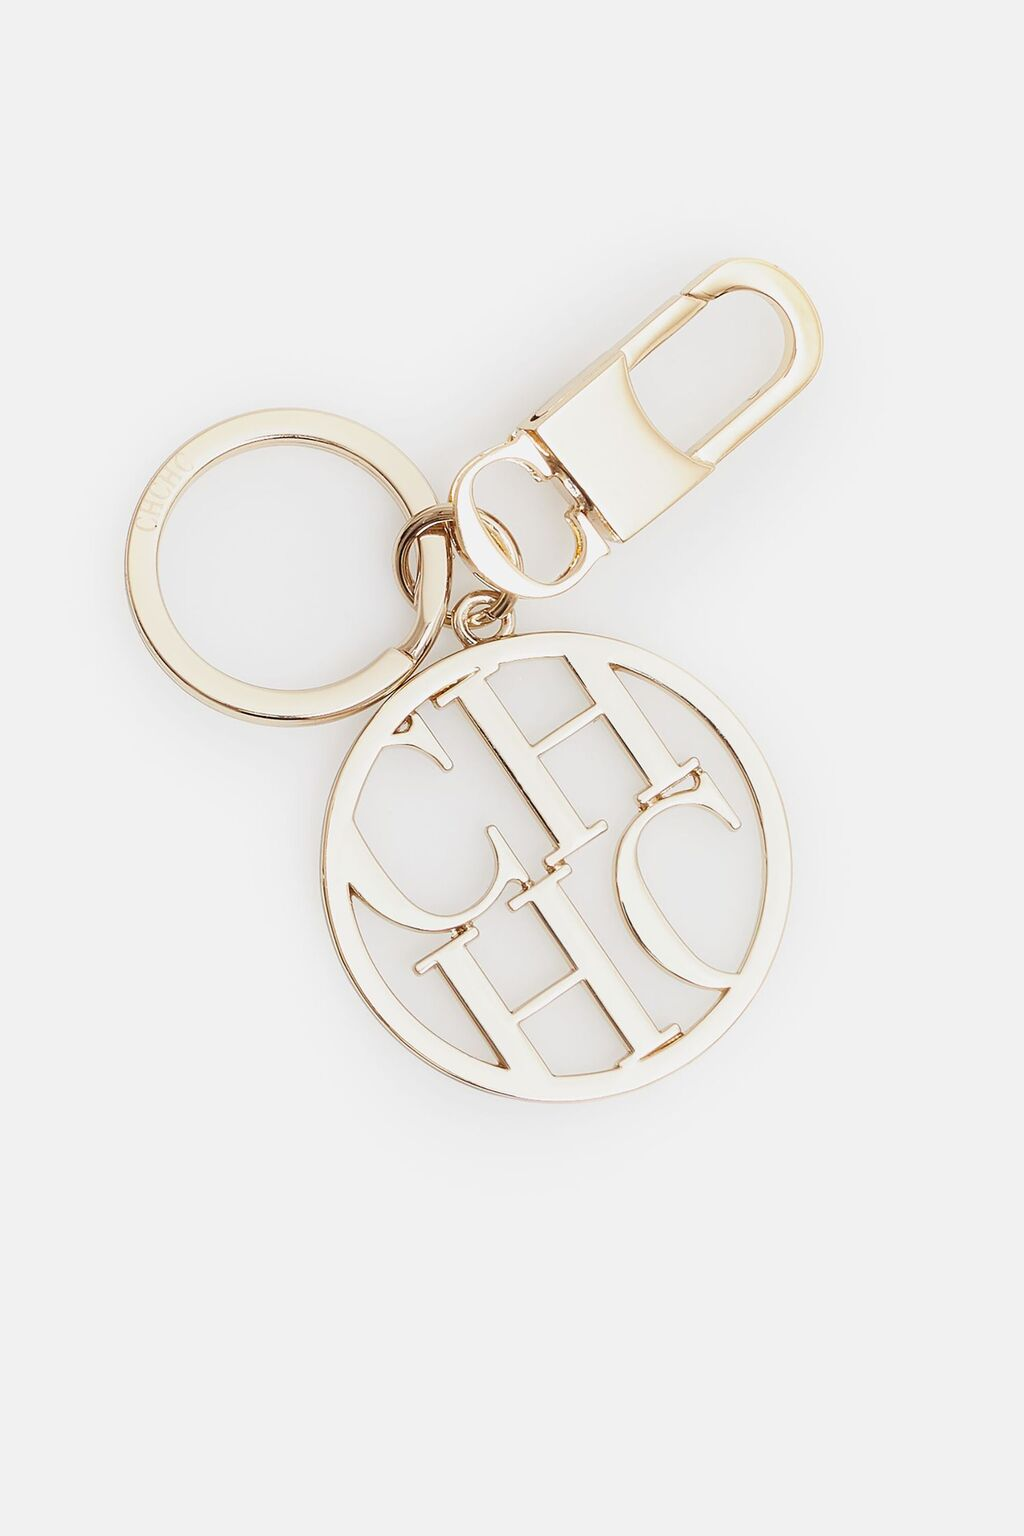 CH Medallion keychain